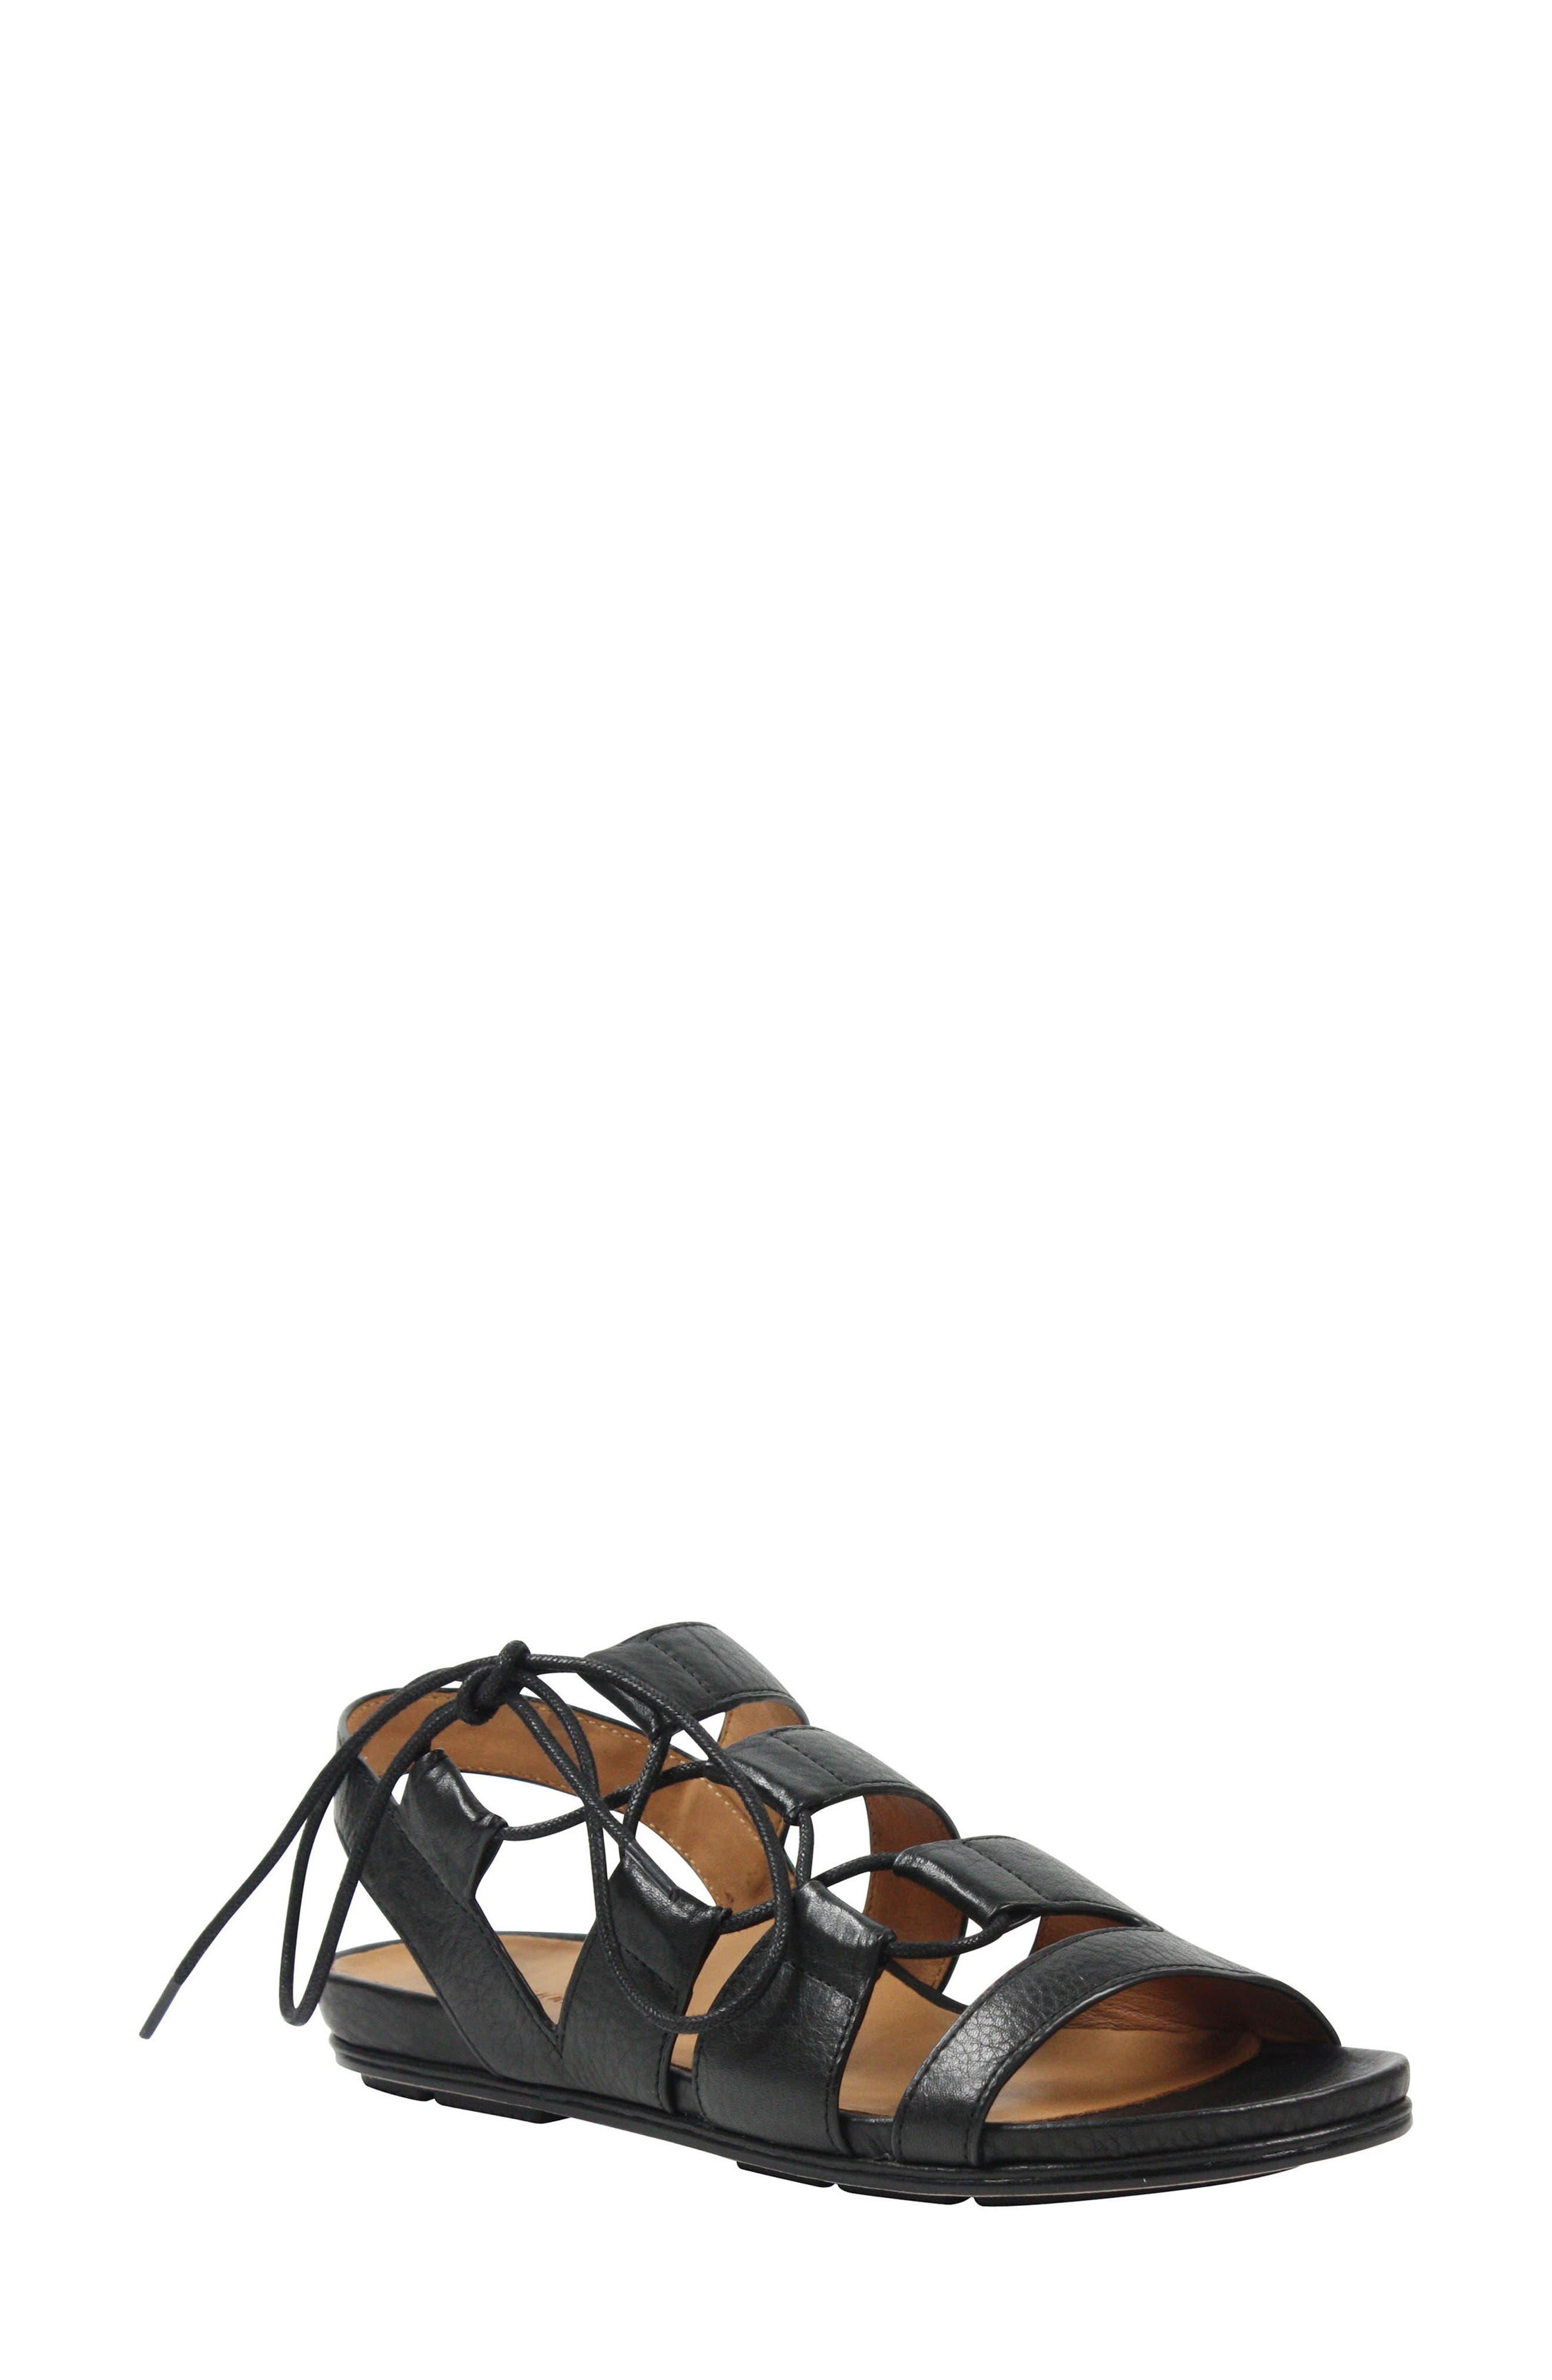 Digbee Sandal,                         Main,                         color, Black Leather